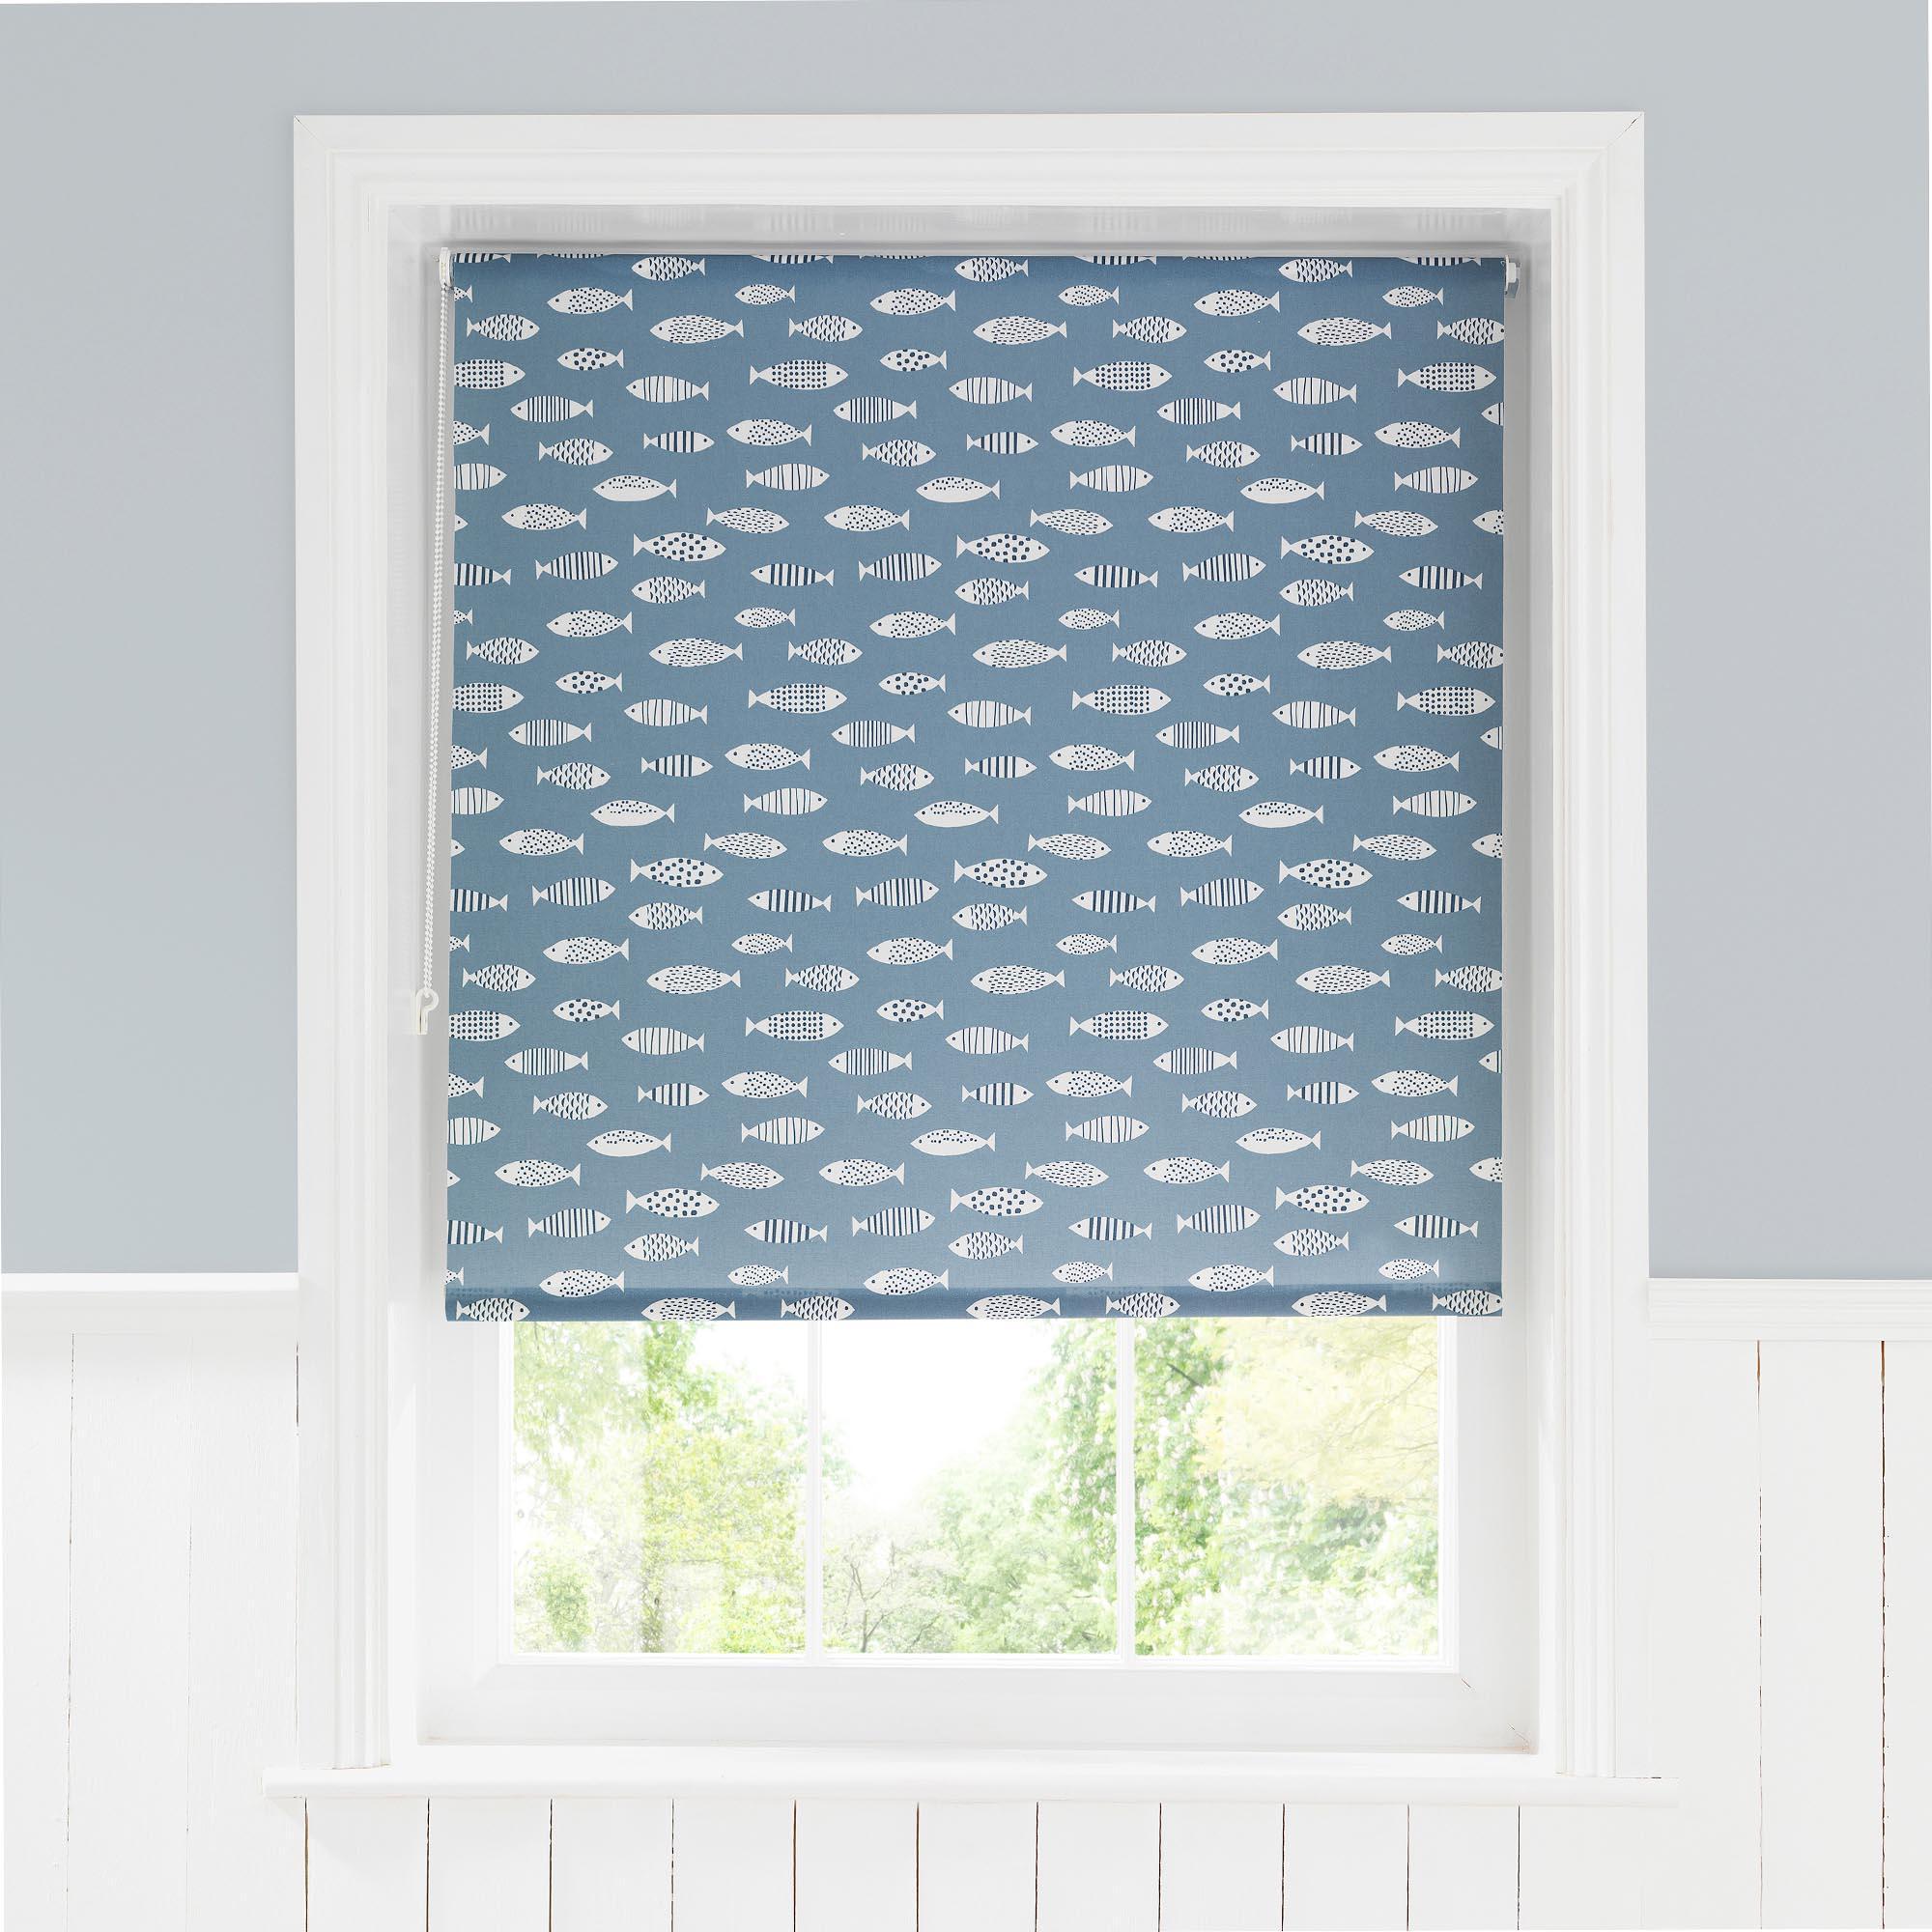 Bathroom blinds 15